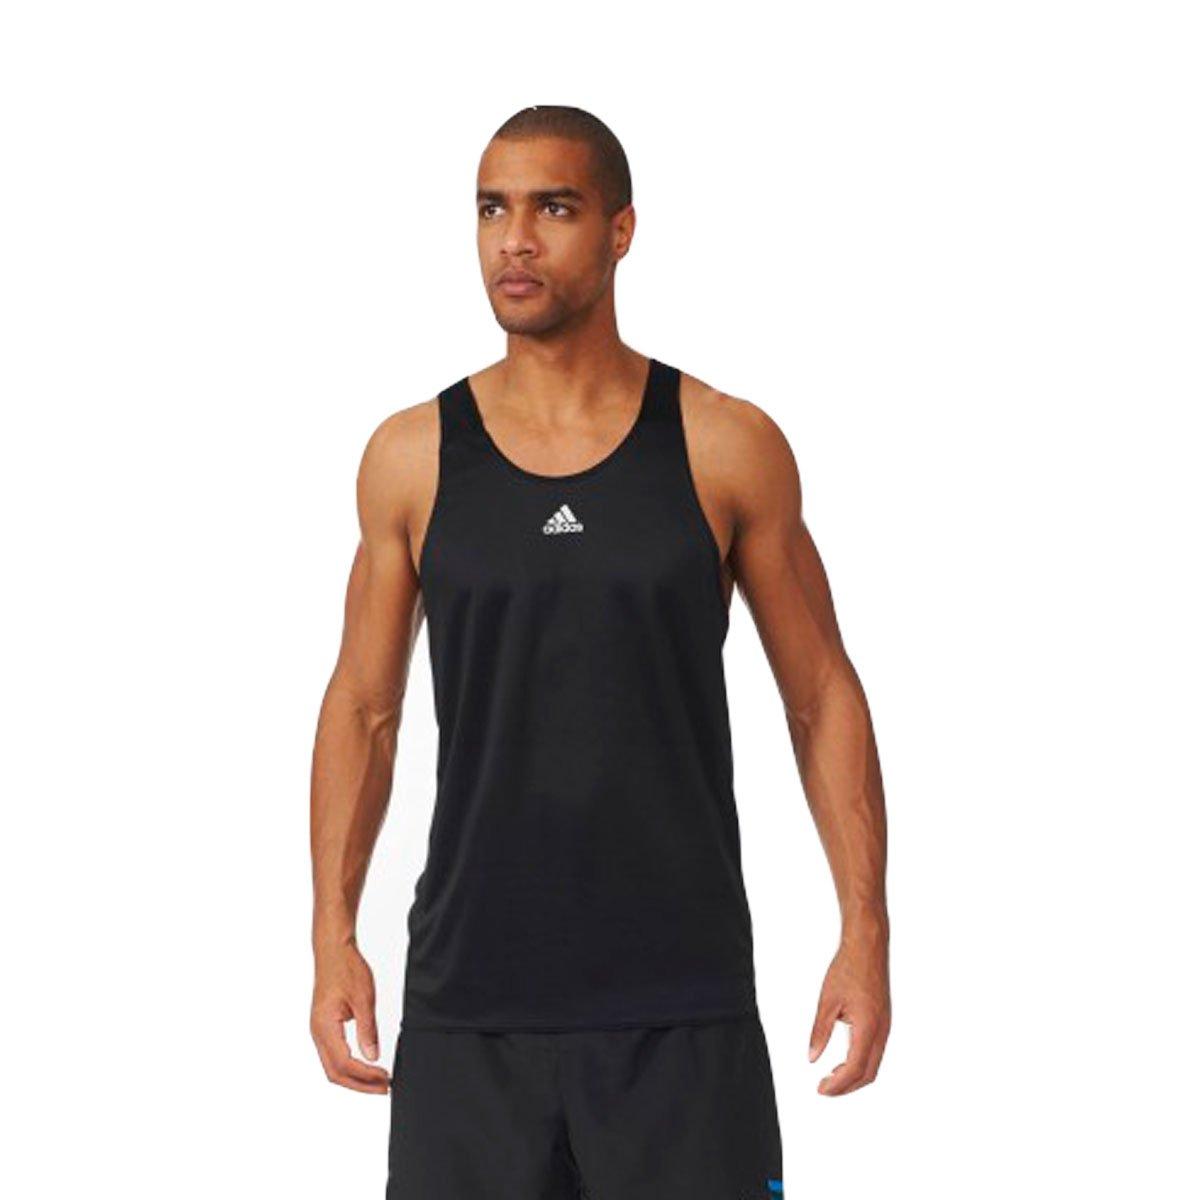 Bizz Store - Regata Masculina Adidas Response M Corrida Preta 9febbfa56dd24